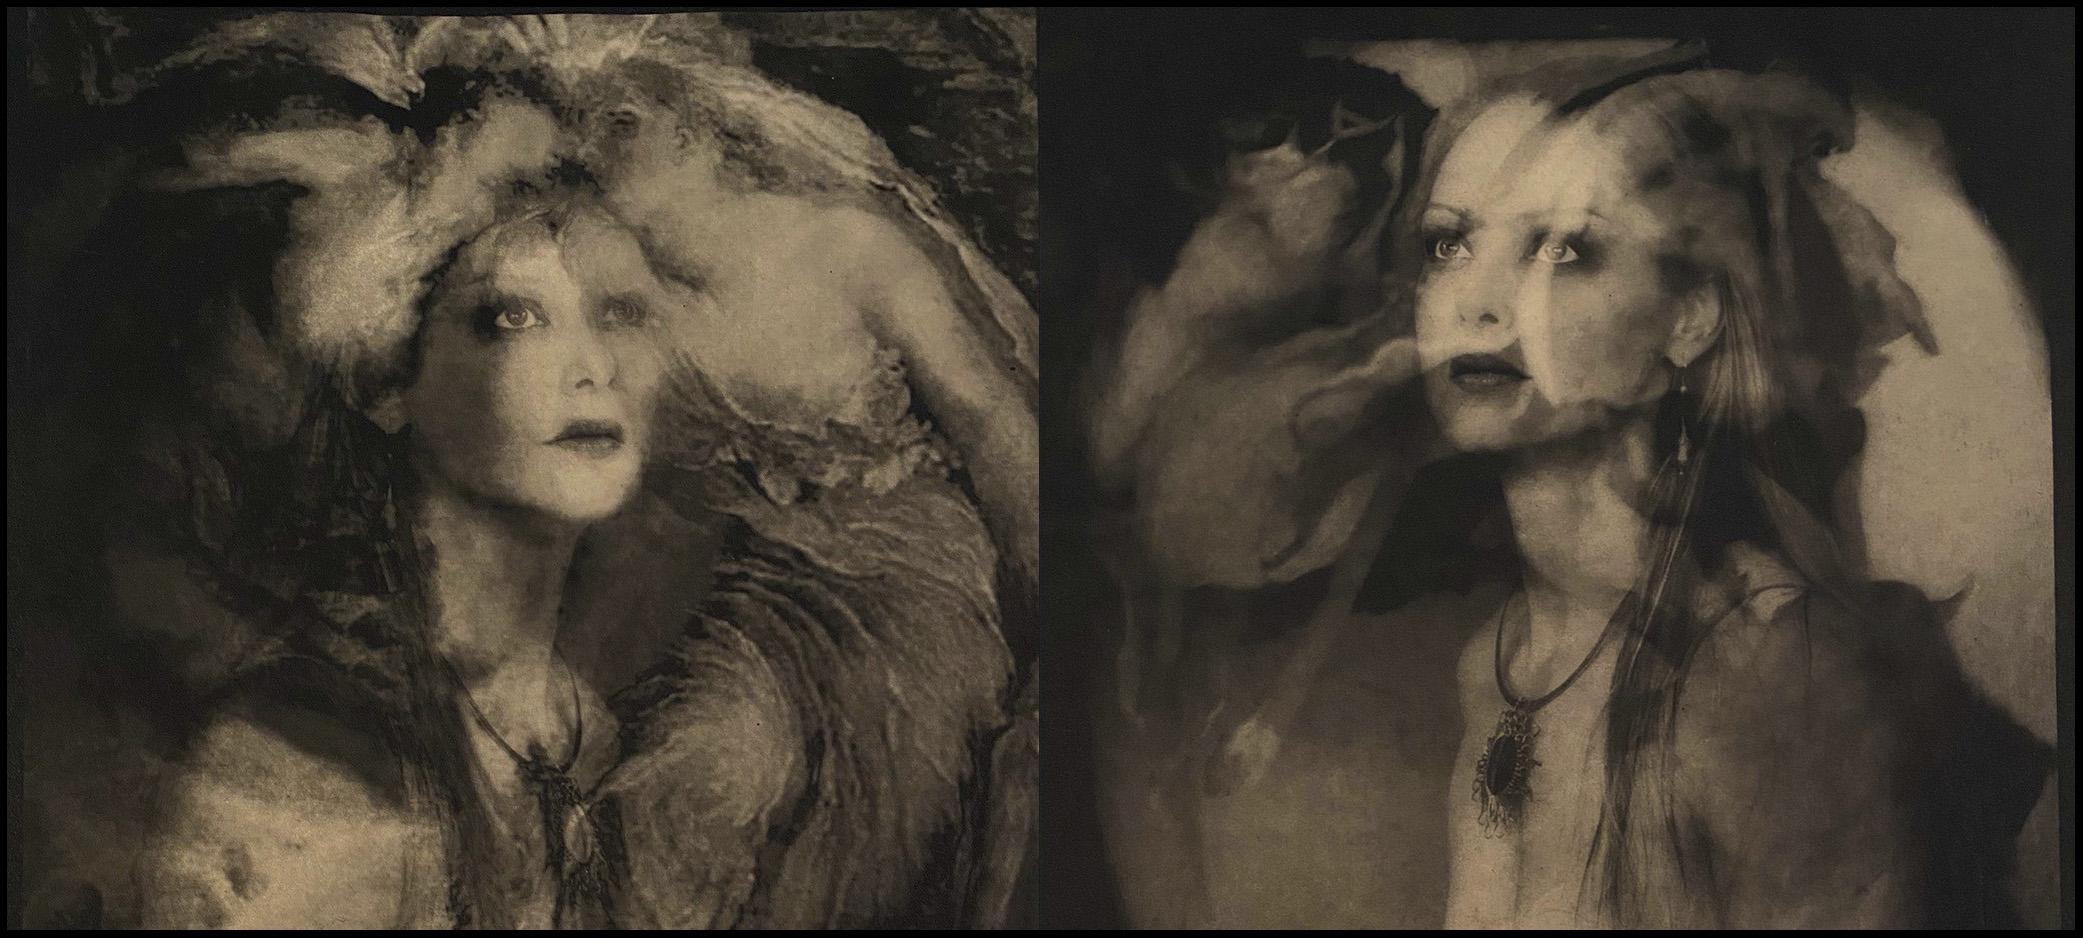 Those Who Dance, Josephine Sacabo